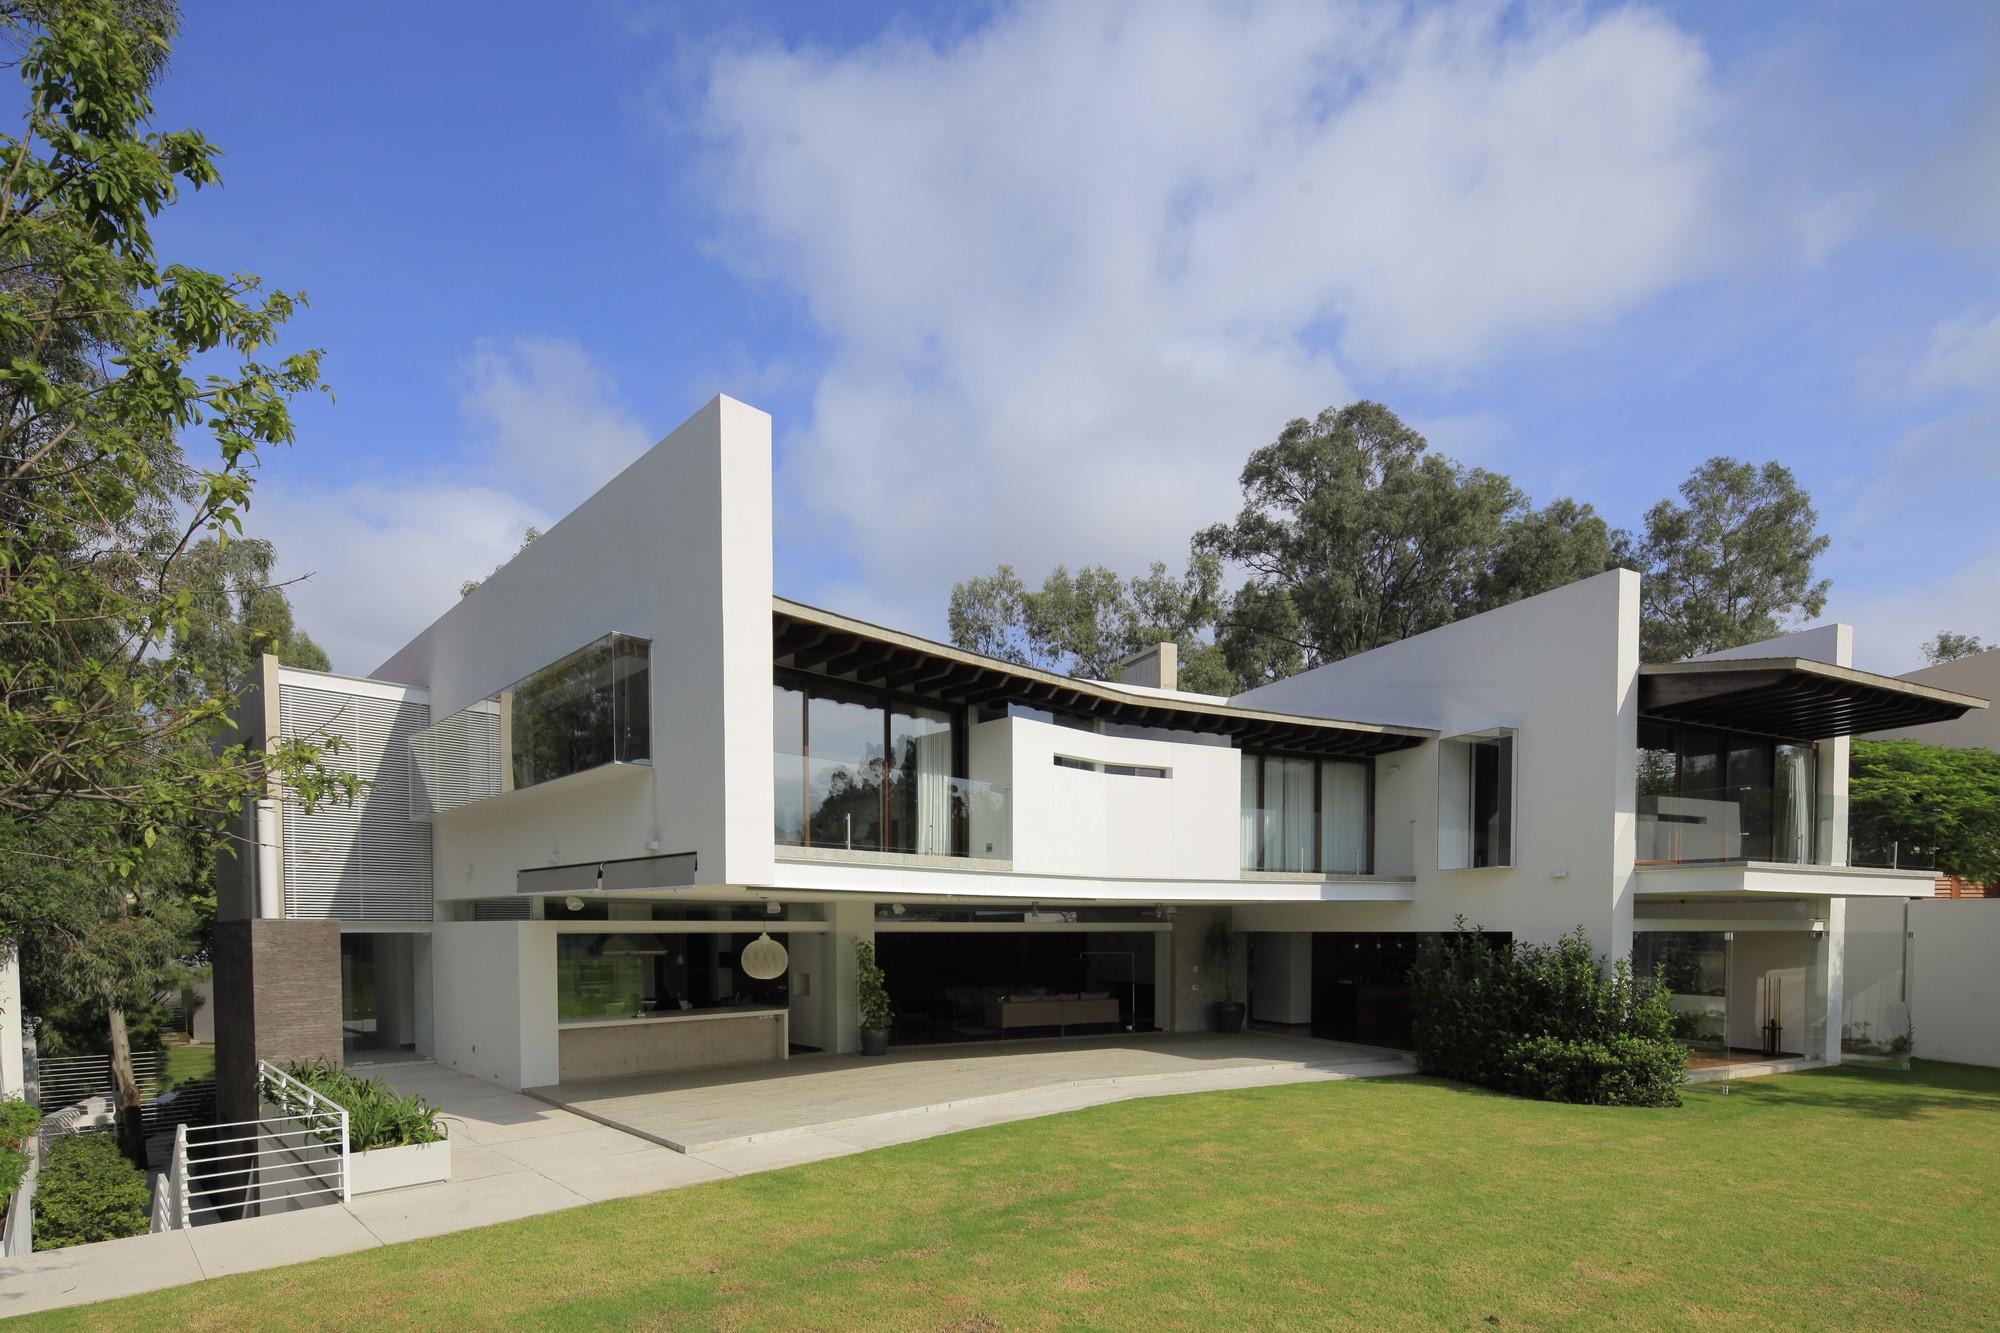 Casa Siete / Hernández Silva Arquitectos